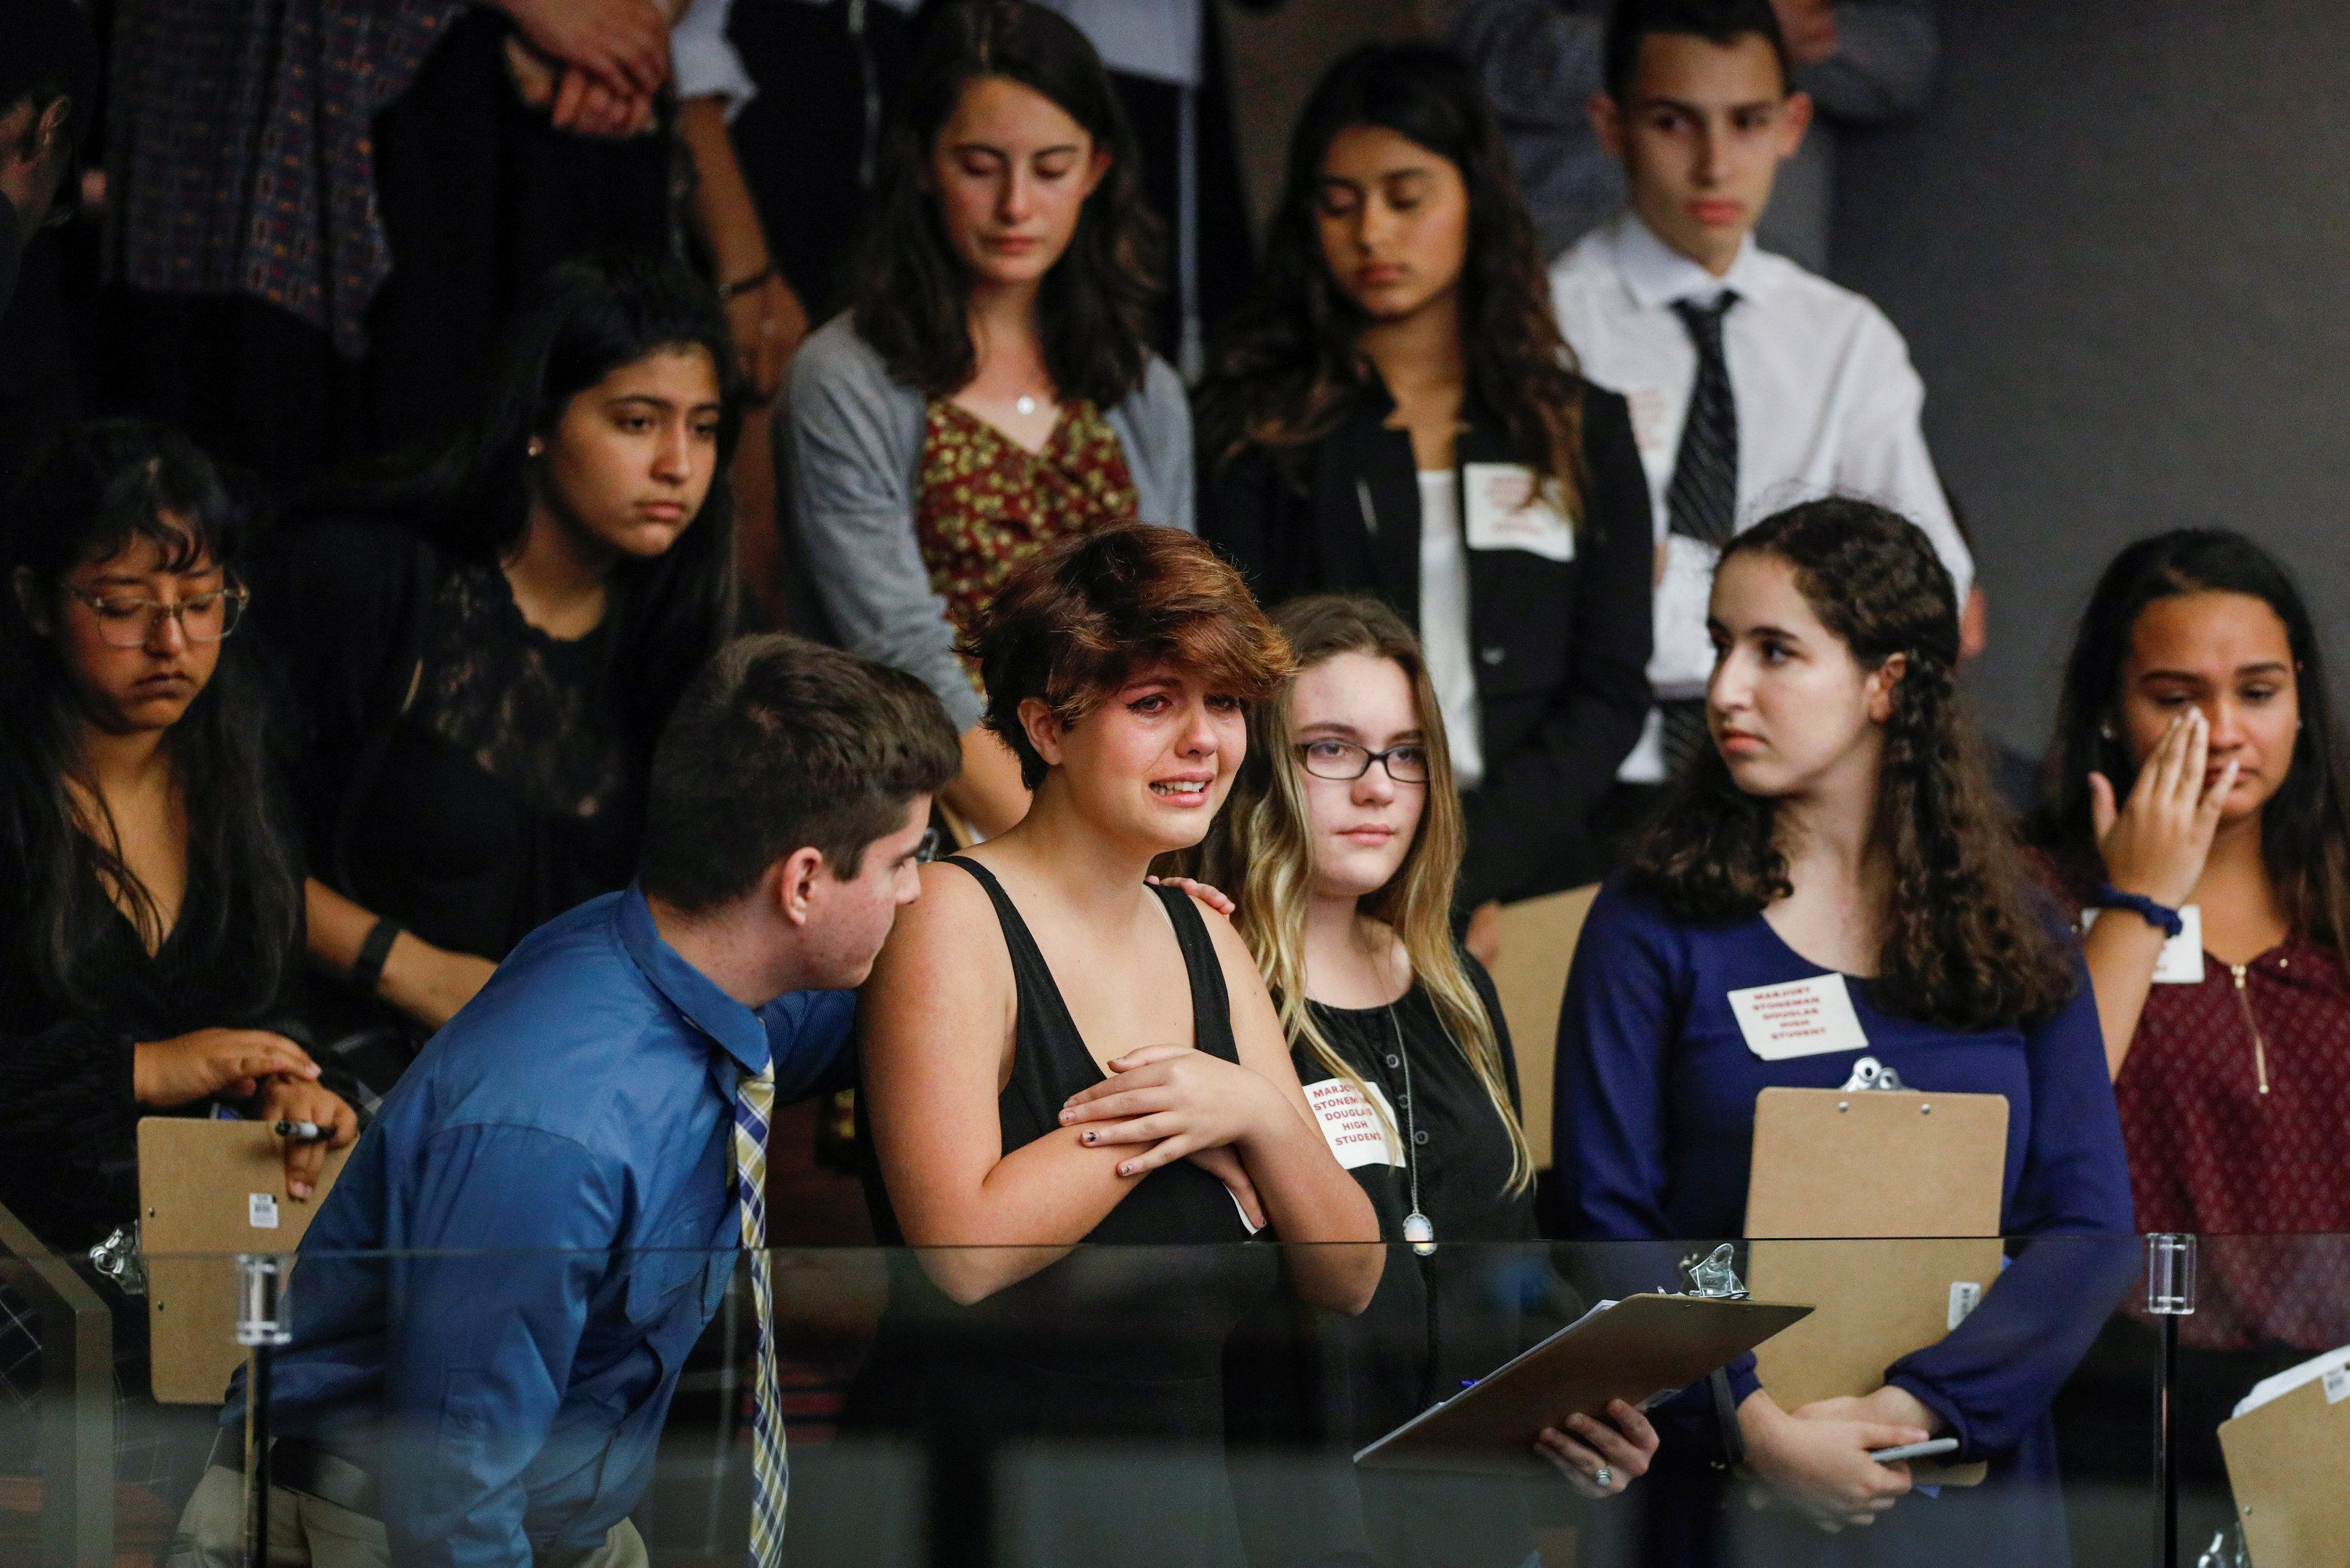 teen-slain-in-massacre-demands